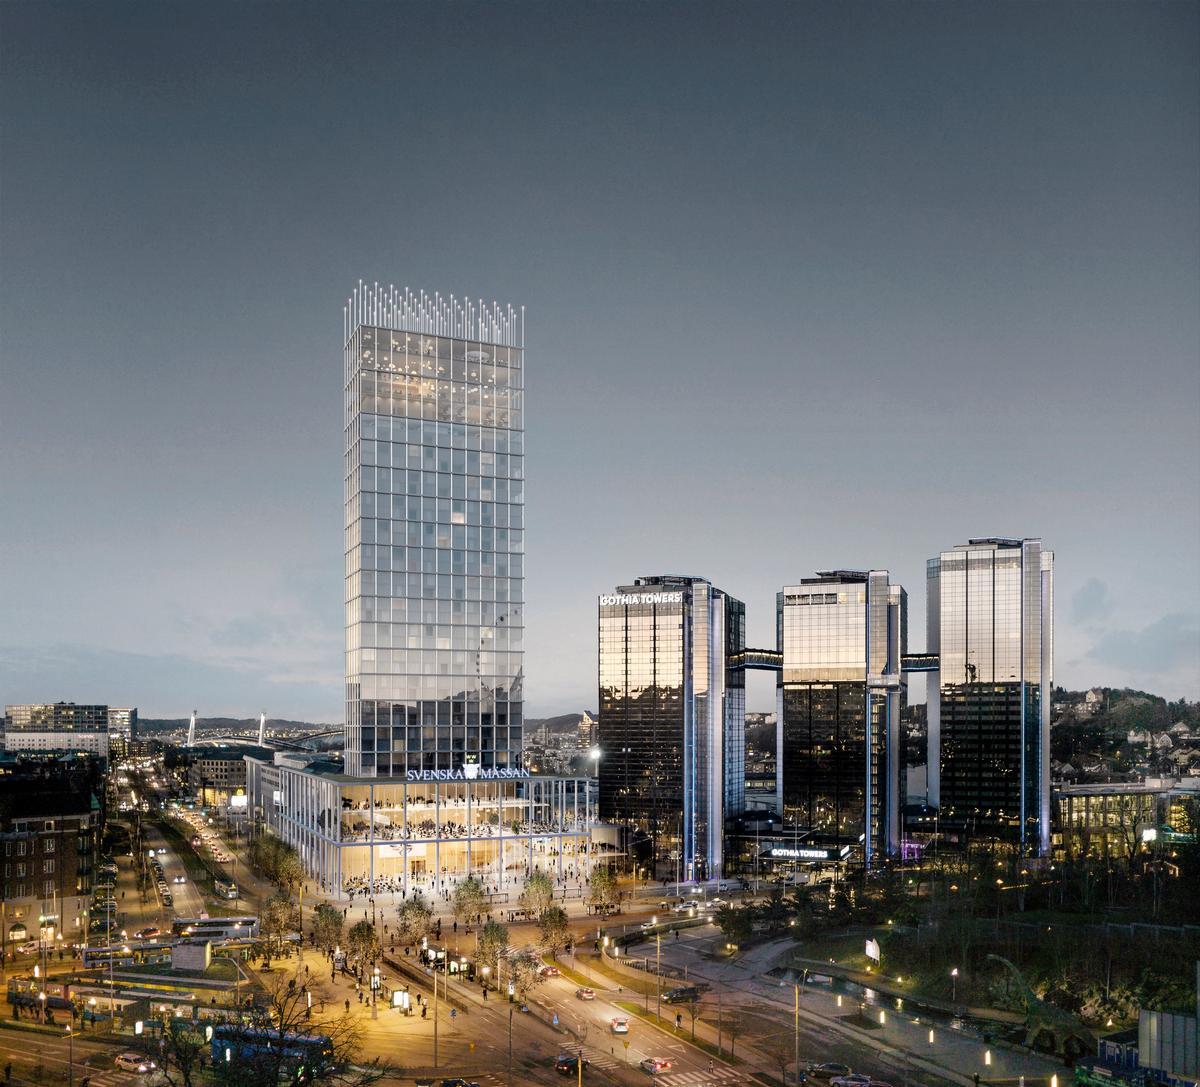 The 28,000sq m (301,000sq ft) development will sit alongside the three existing Gothia Towers / Tham & Videgård Arkitekter